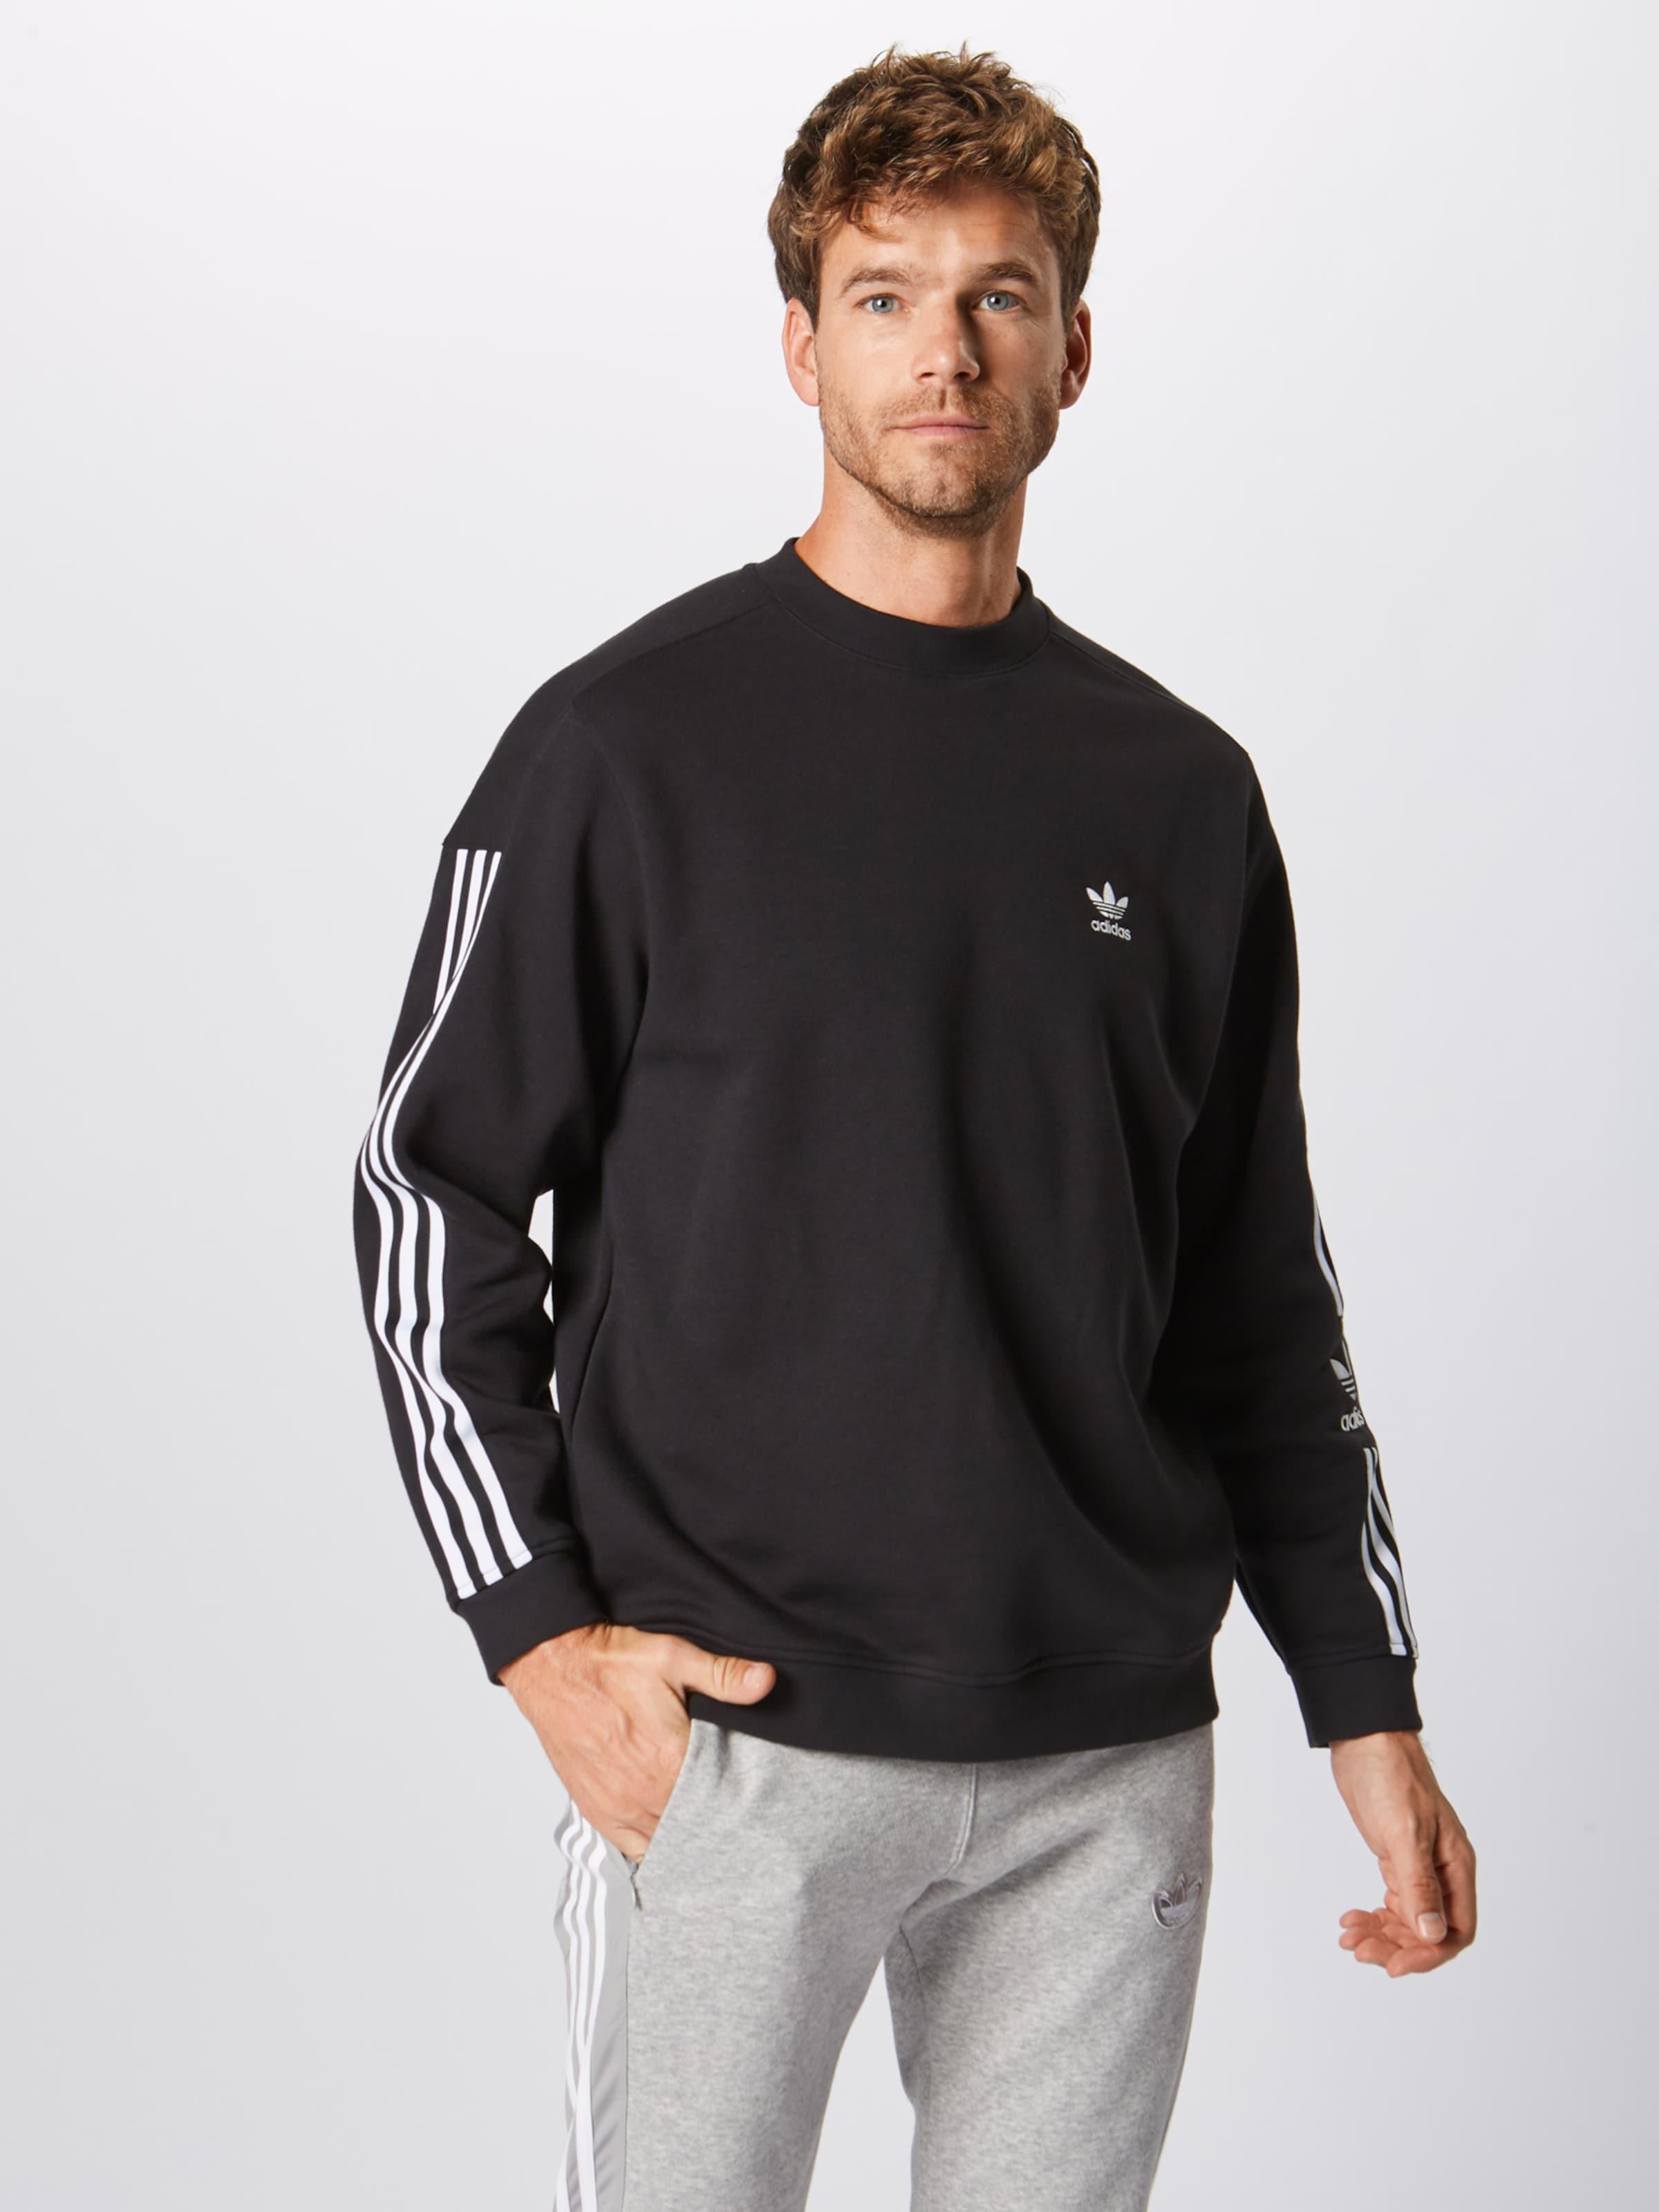 Adidas NoirBlanc En Originals Sweat shirt xBoderQCW